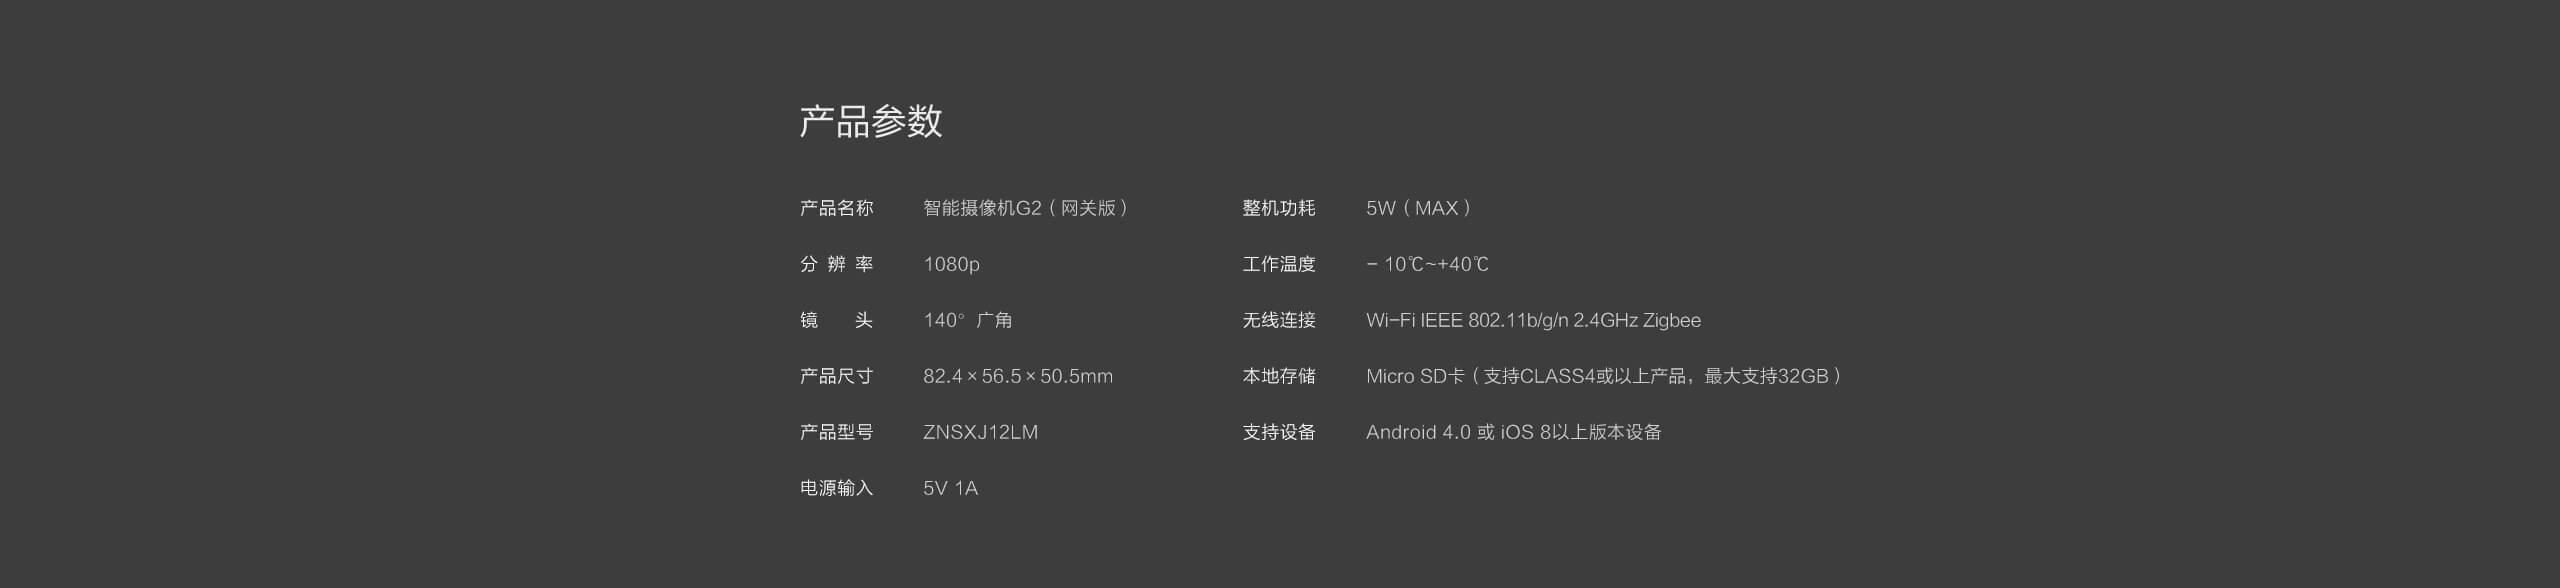 Aqara 智能摄像机 G2 - 产品参数